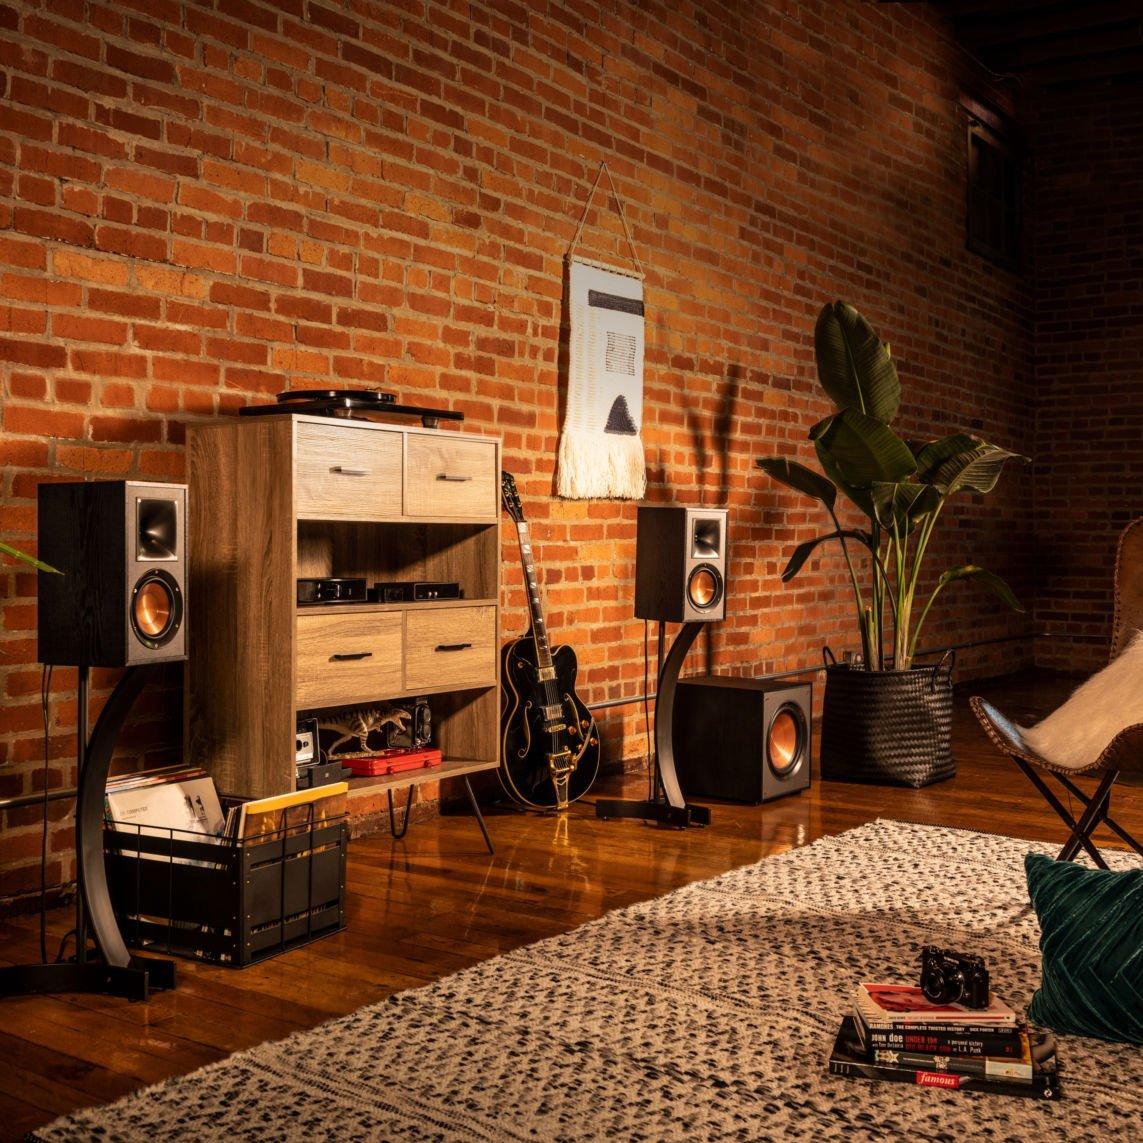 Living room with Klipsch speakers